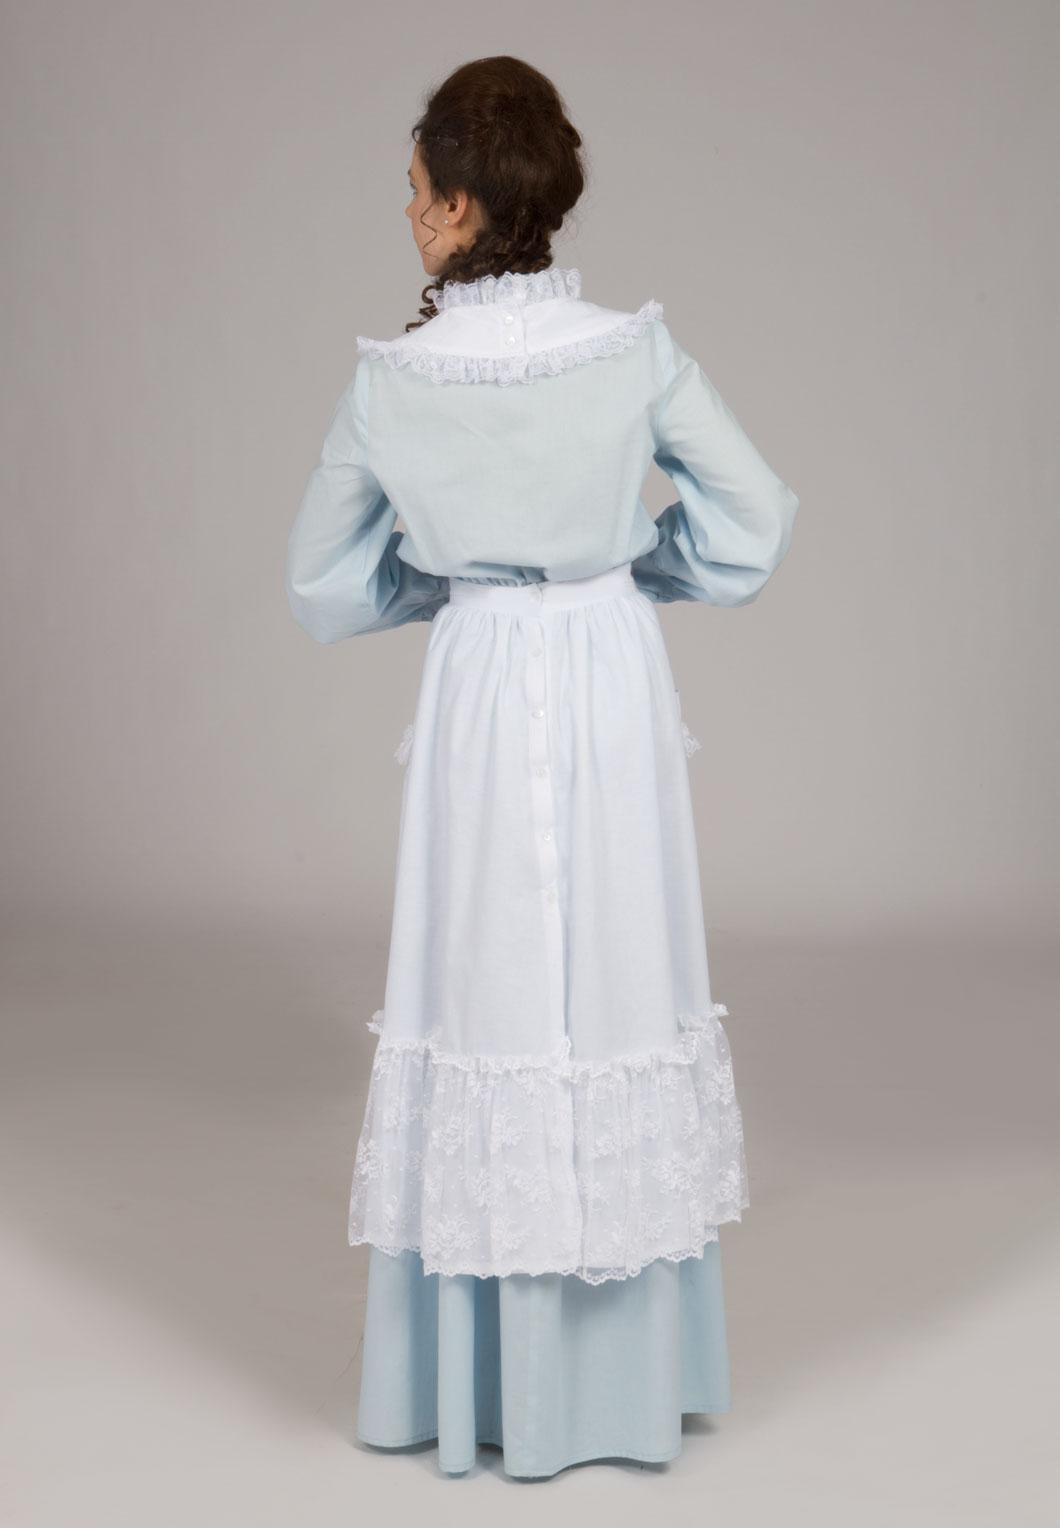 Edwardian white apron - Victorian Edwardian Apron